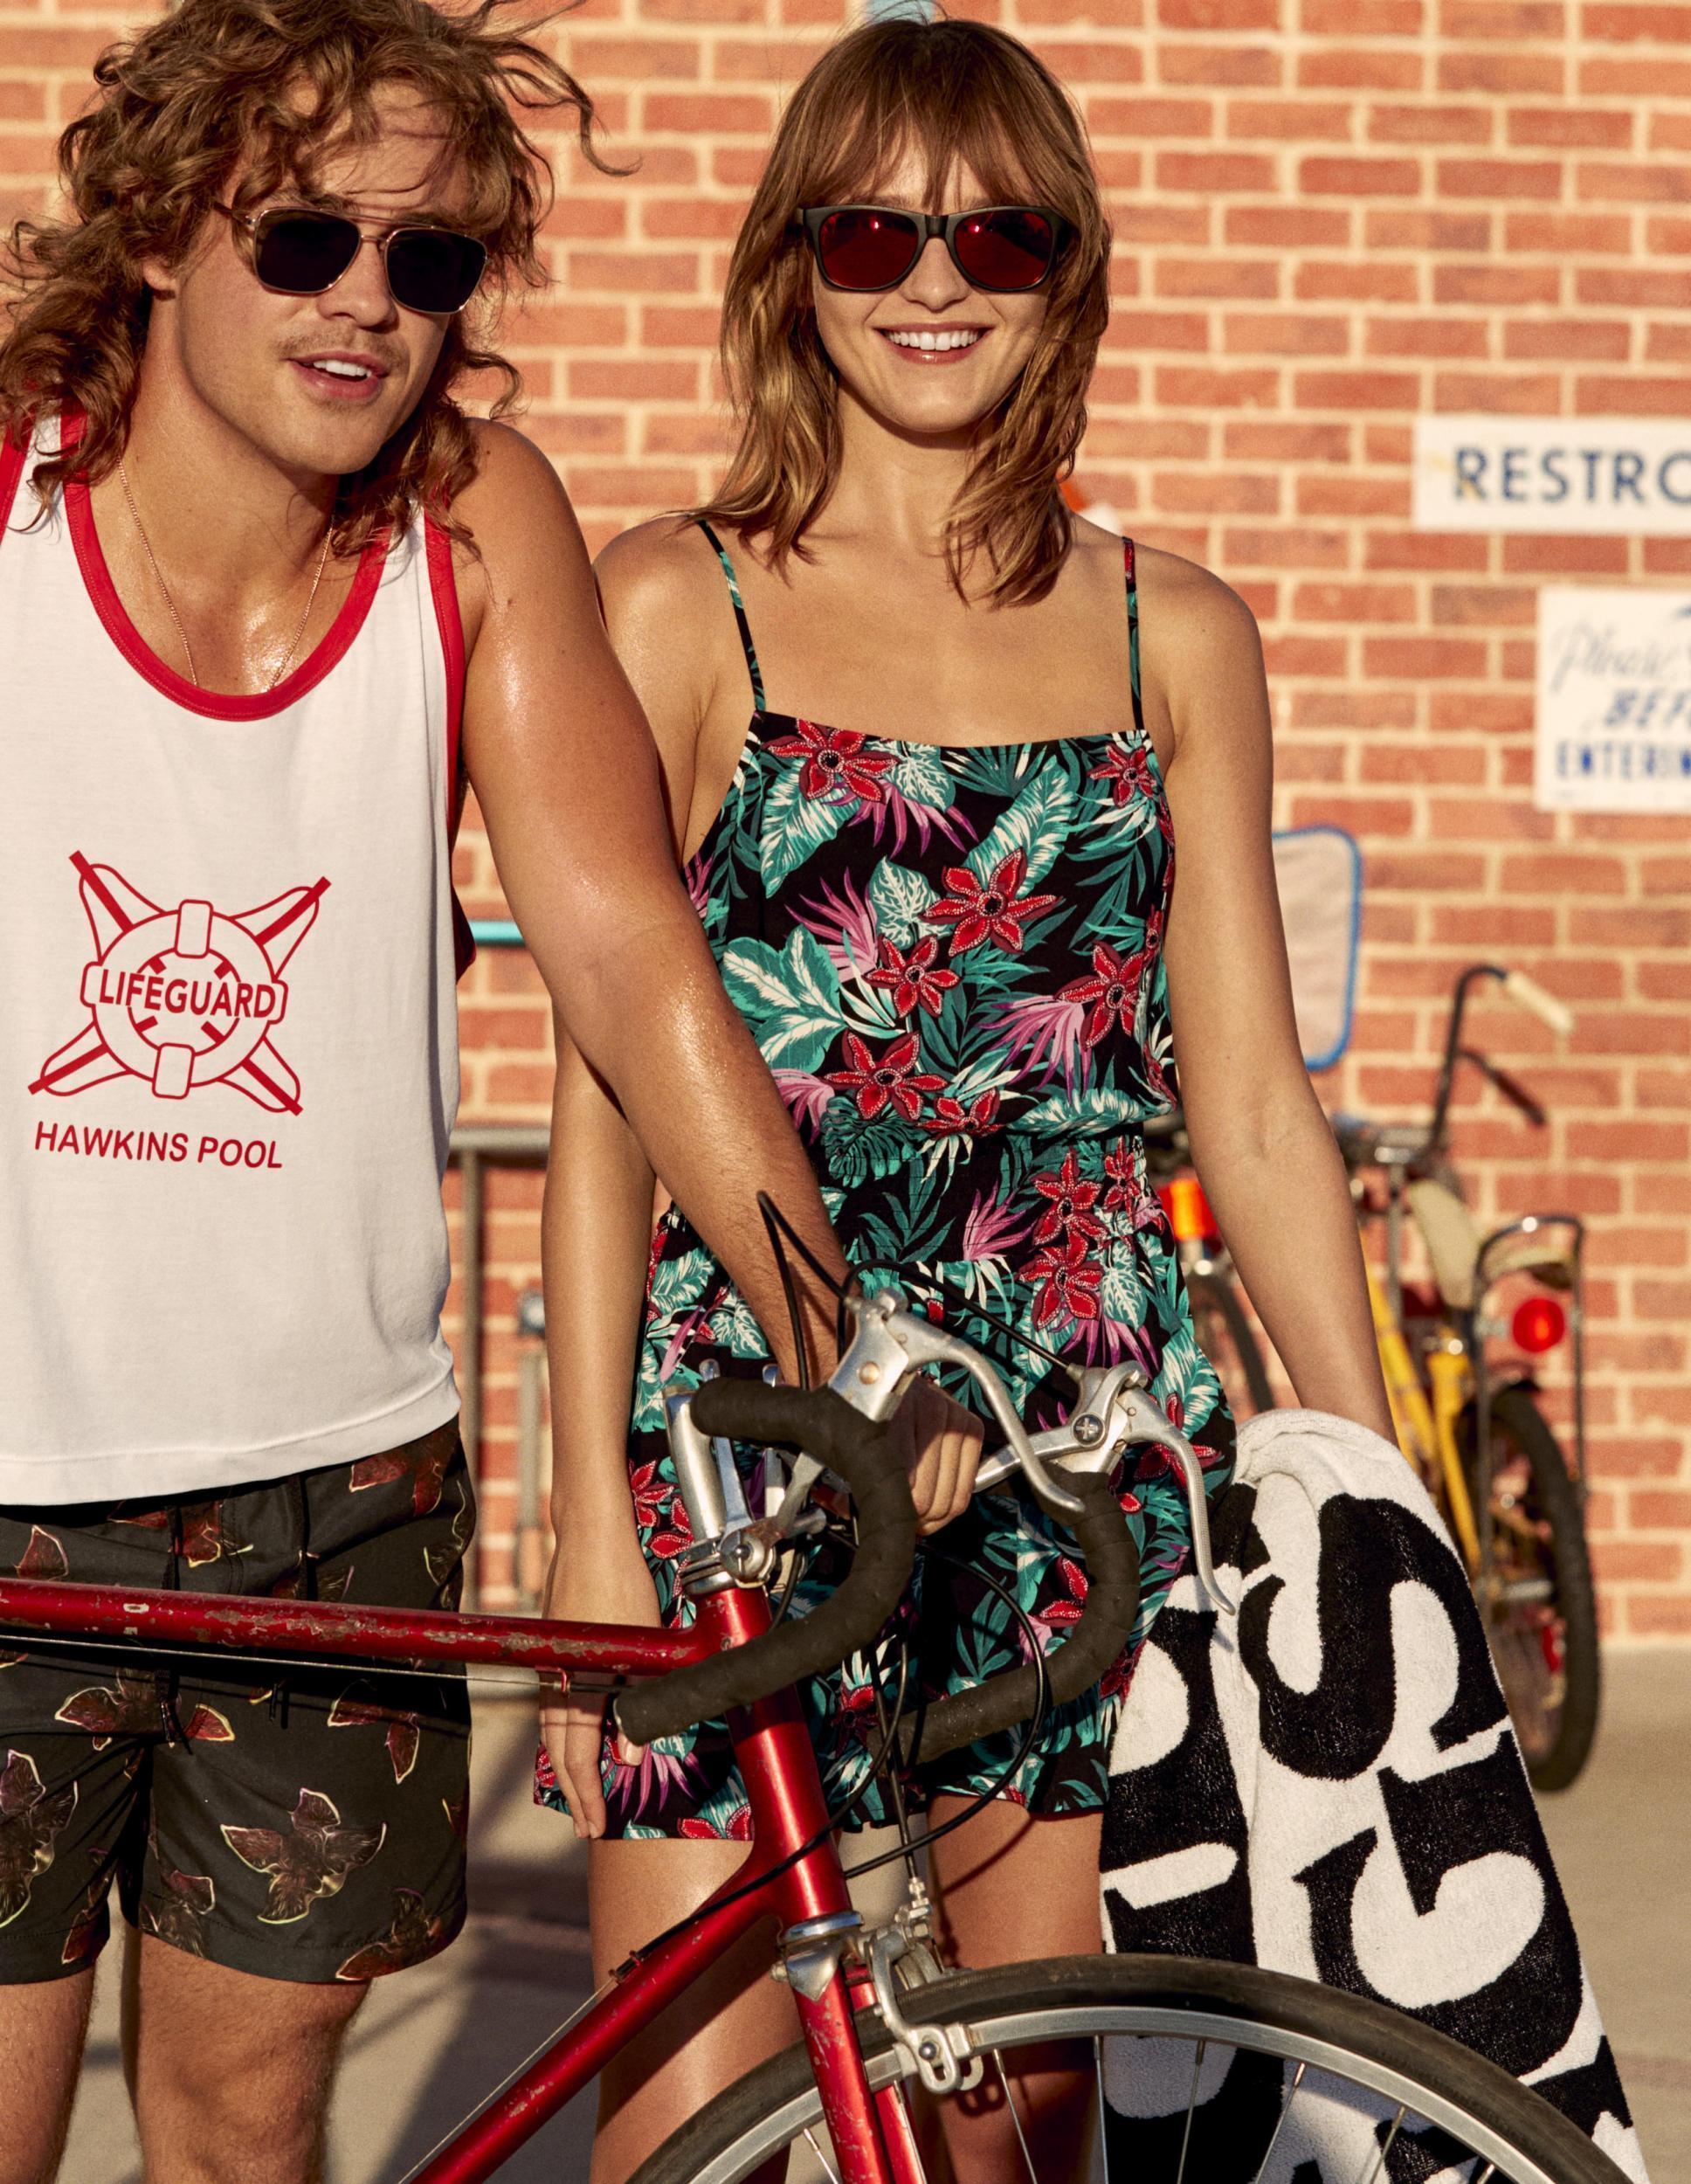 stranger things 80s fashion in H&M